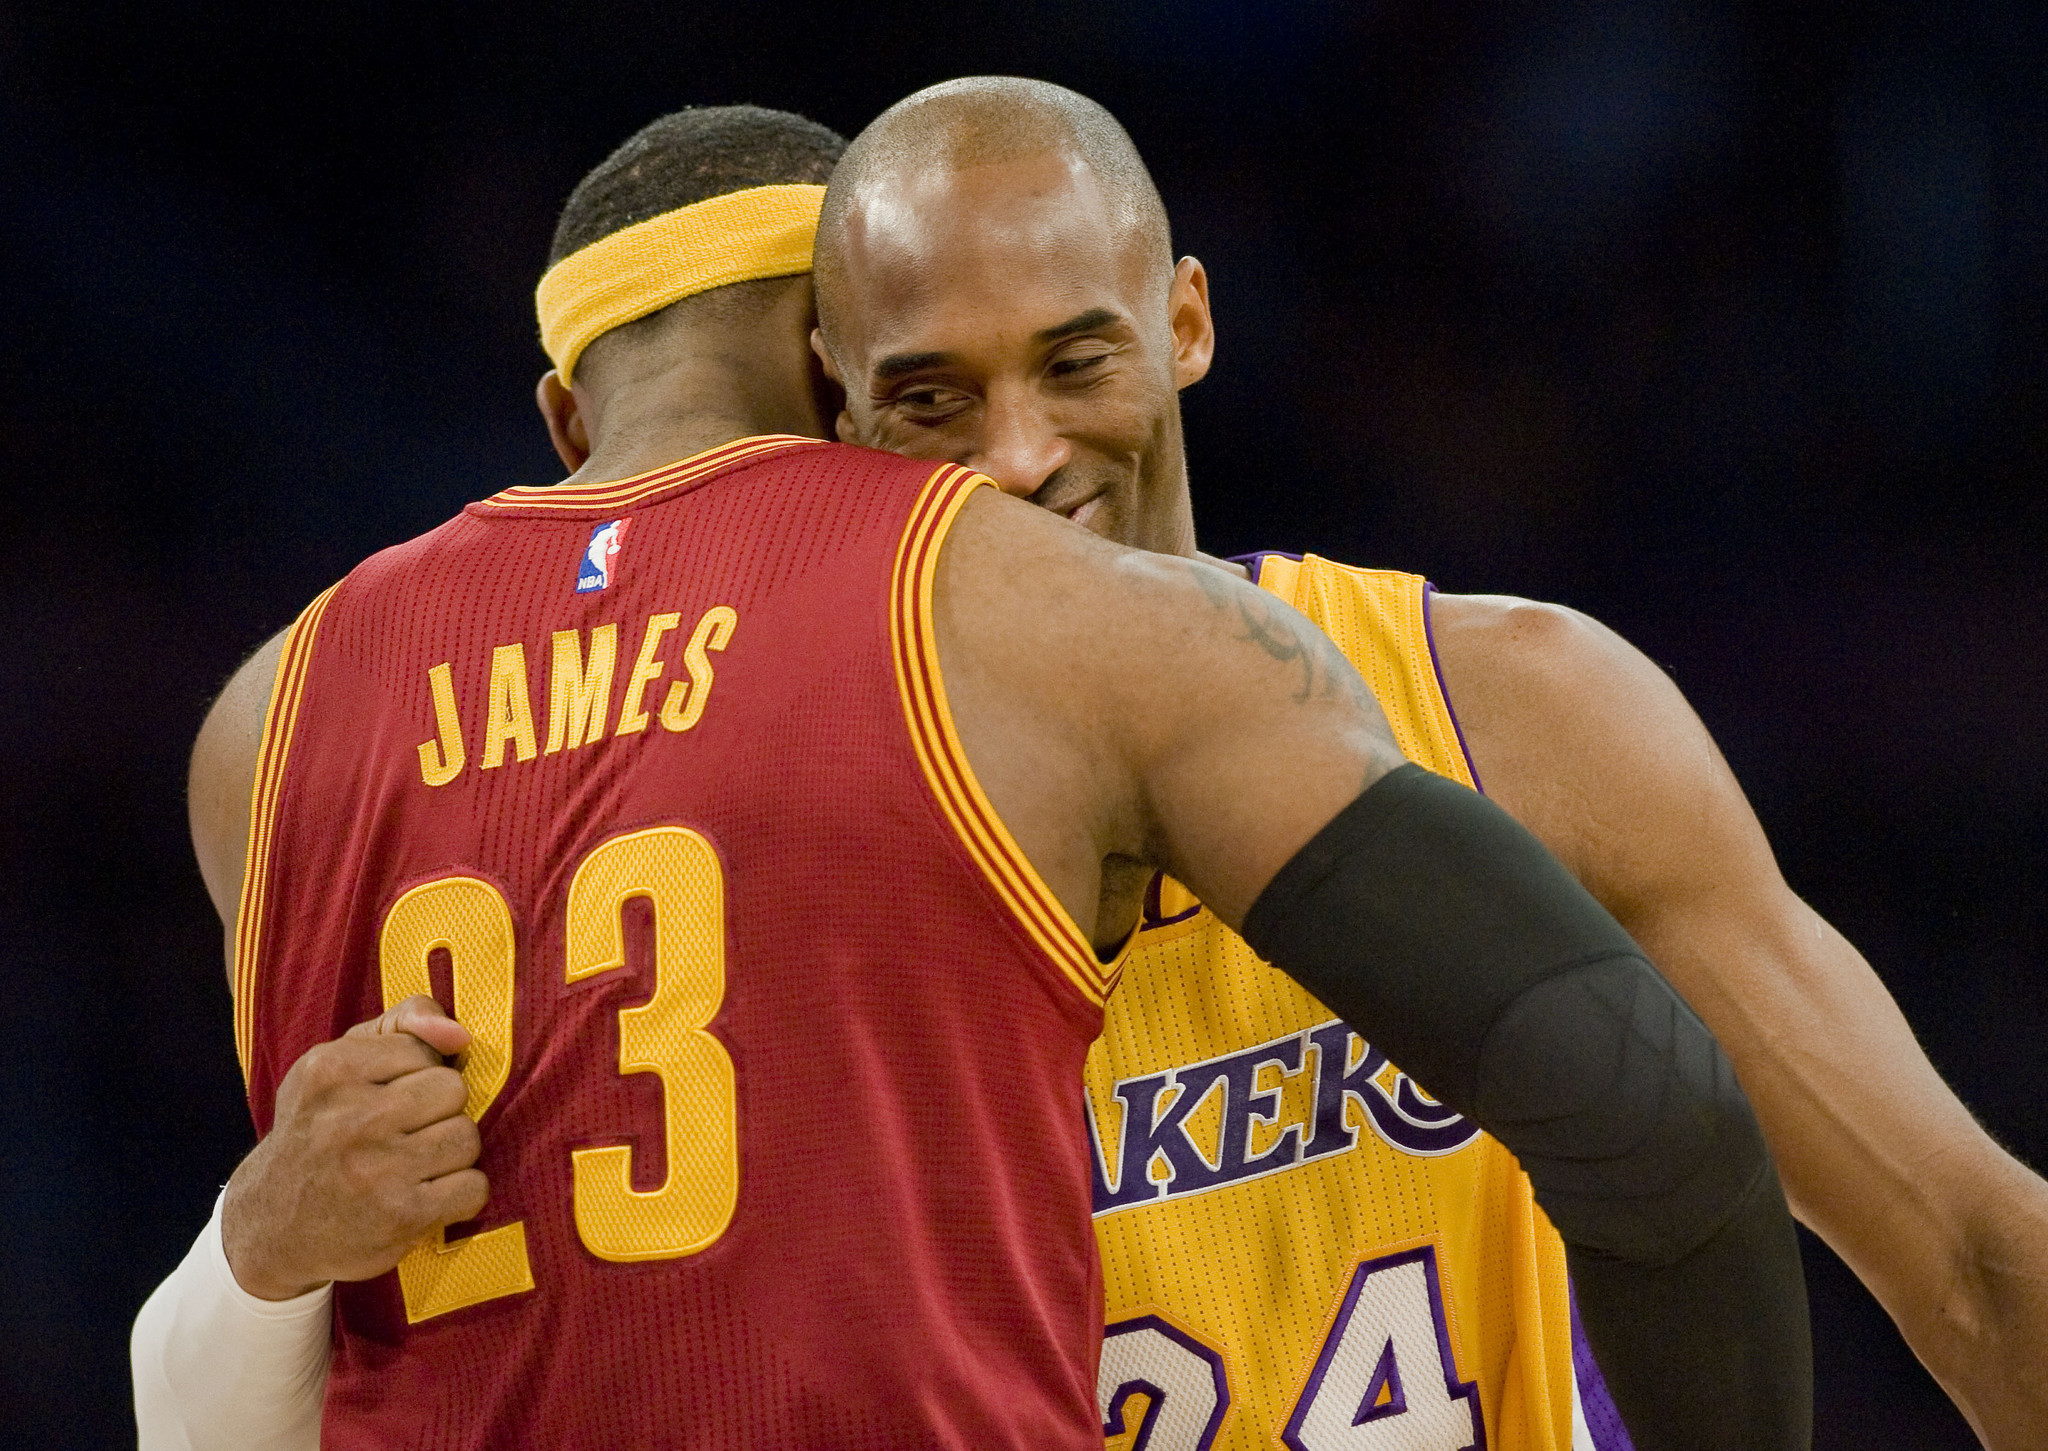 LeBron James 'heartbroken and devastated' by death of Kobe Bryant